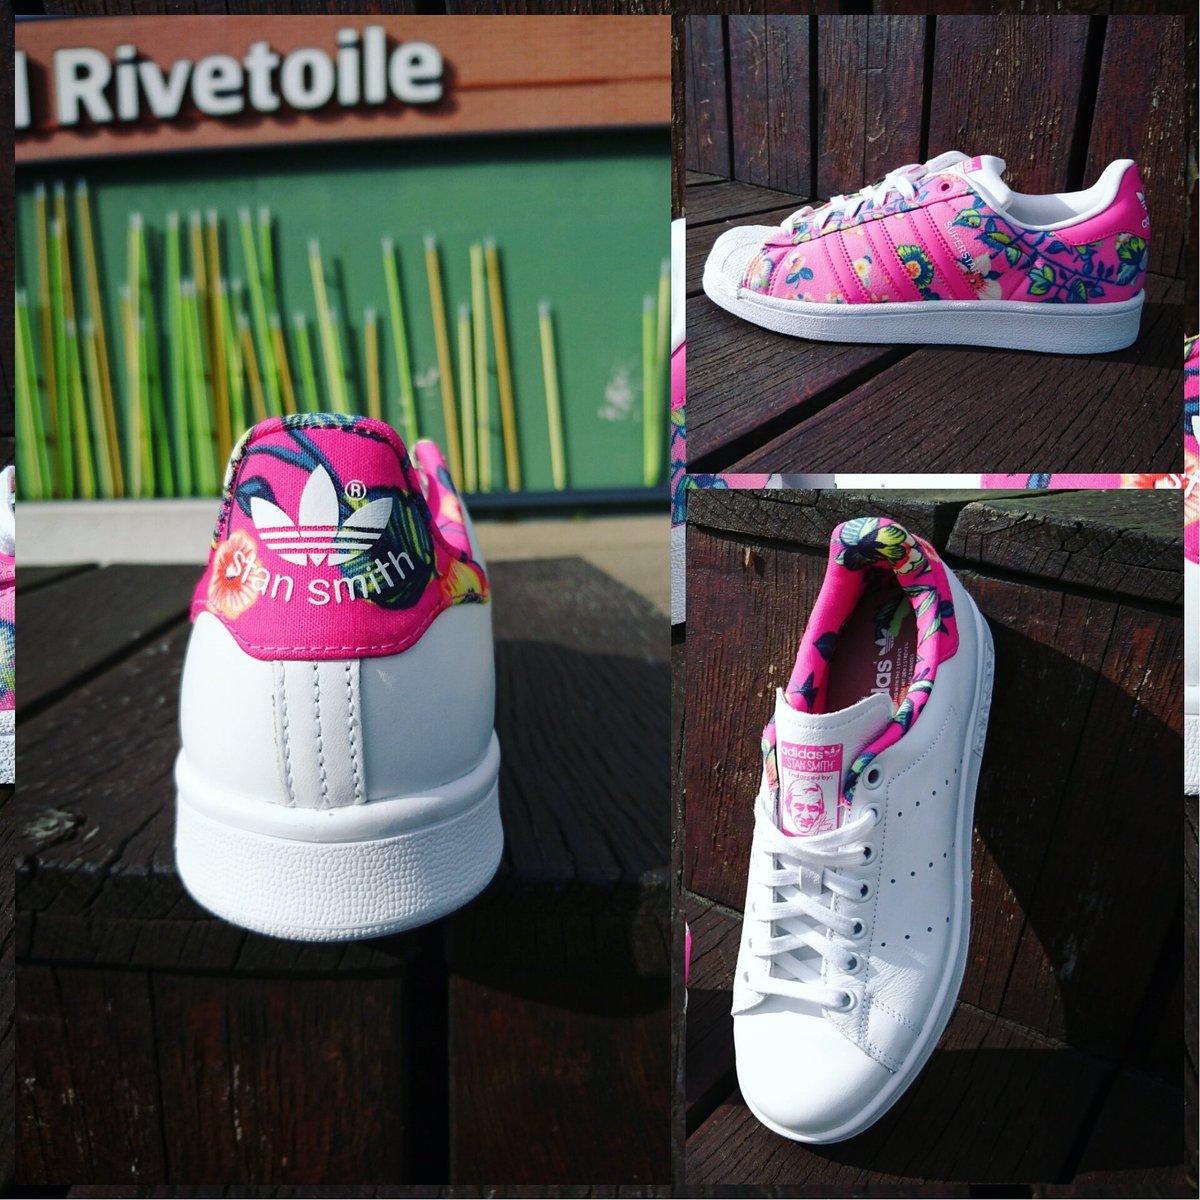 pas mal b1ce5 9775f Adidas O. Rivetoile on Twitter: